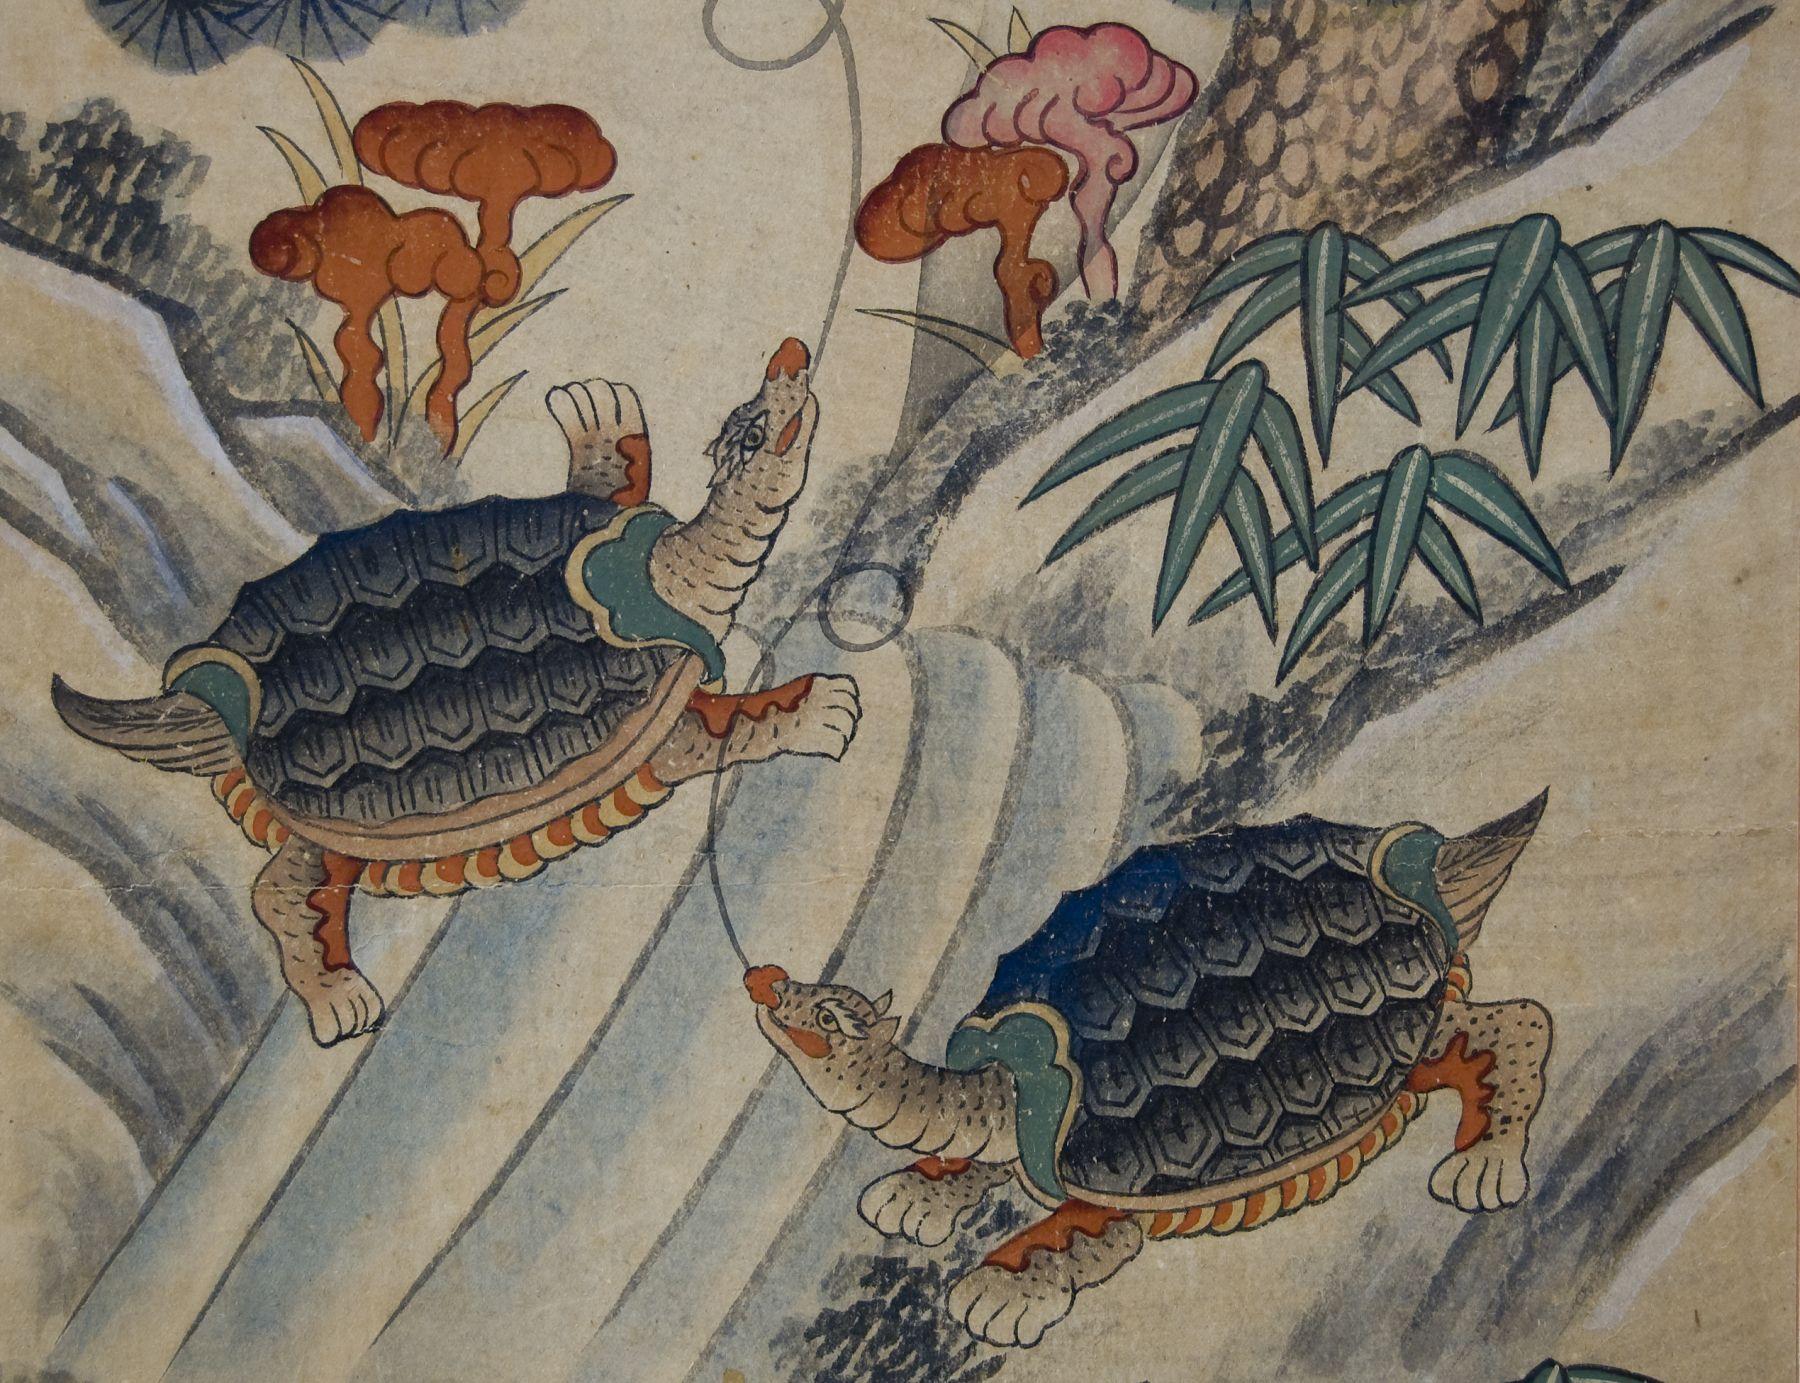 Shipjangsang